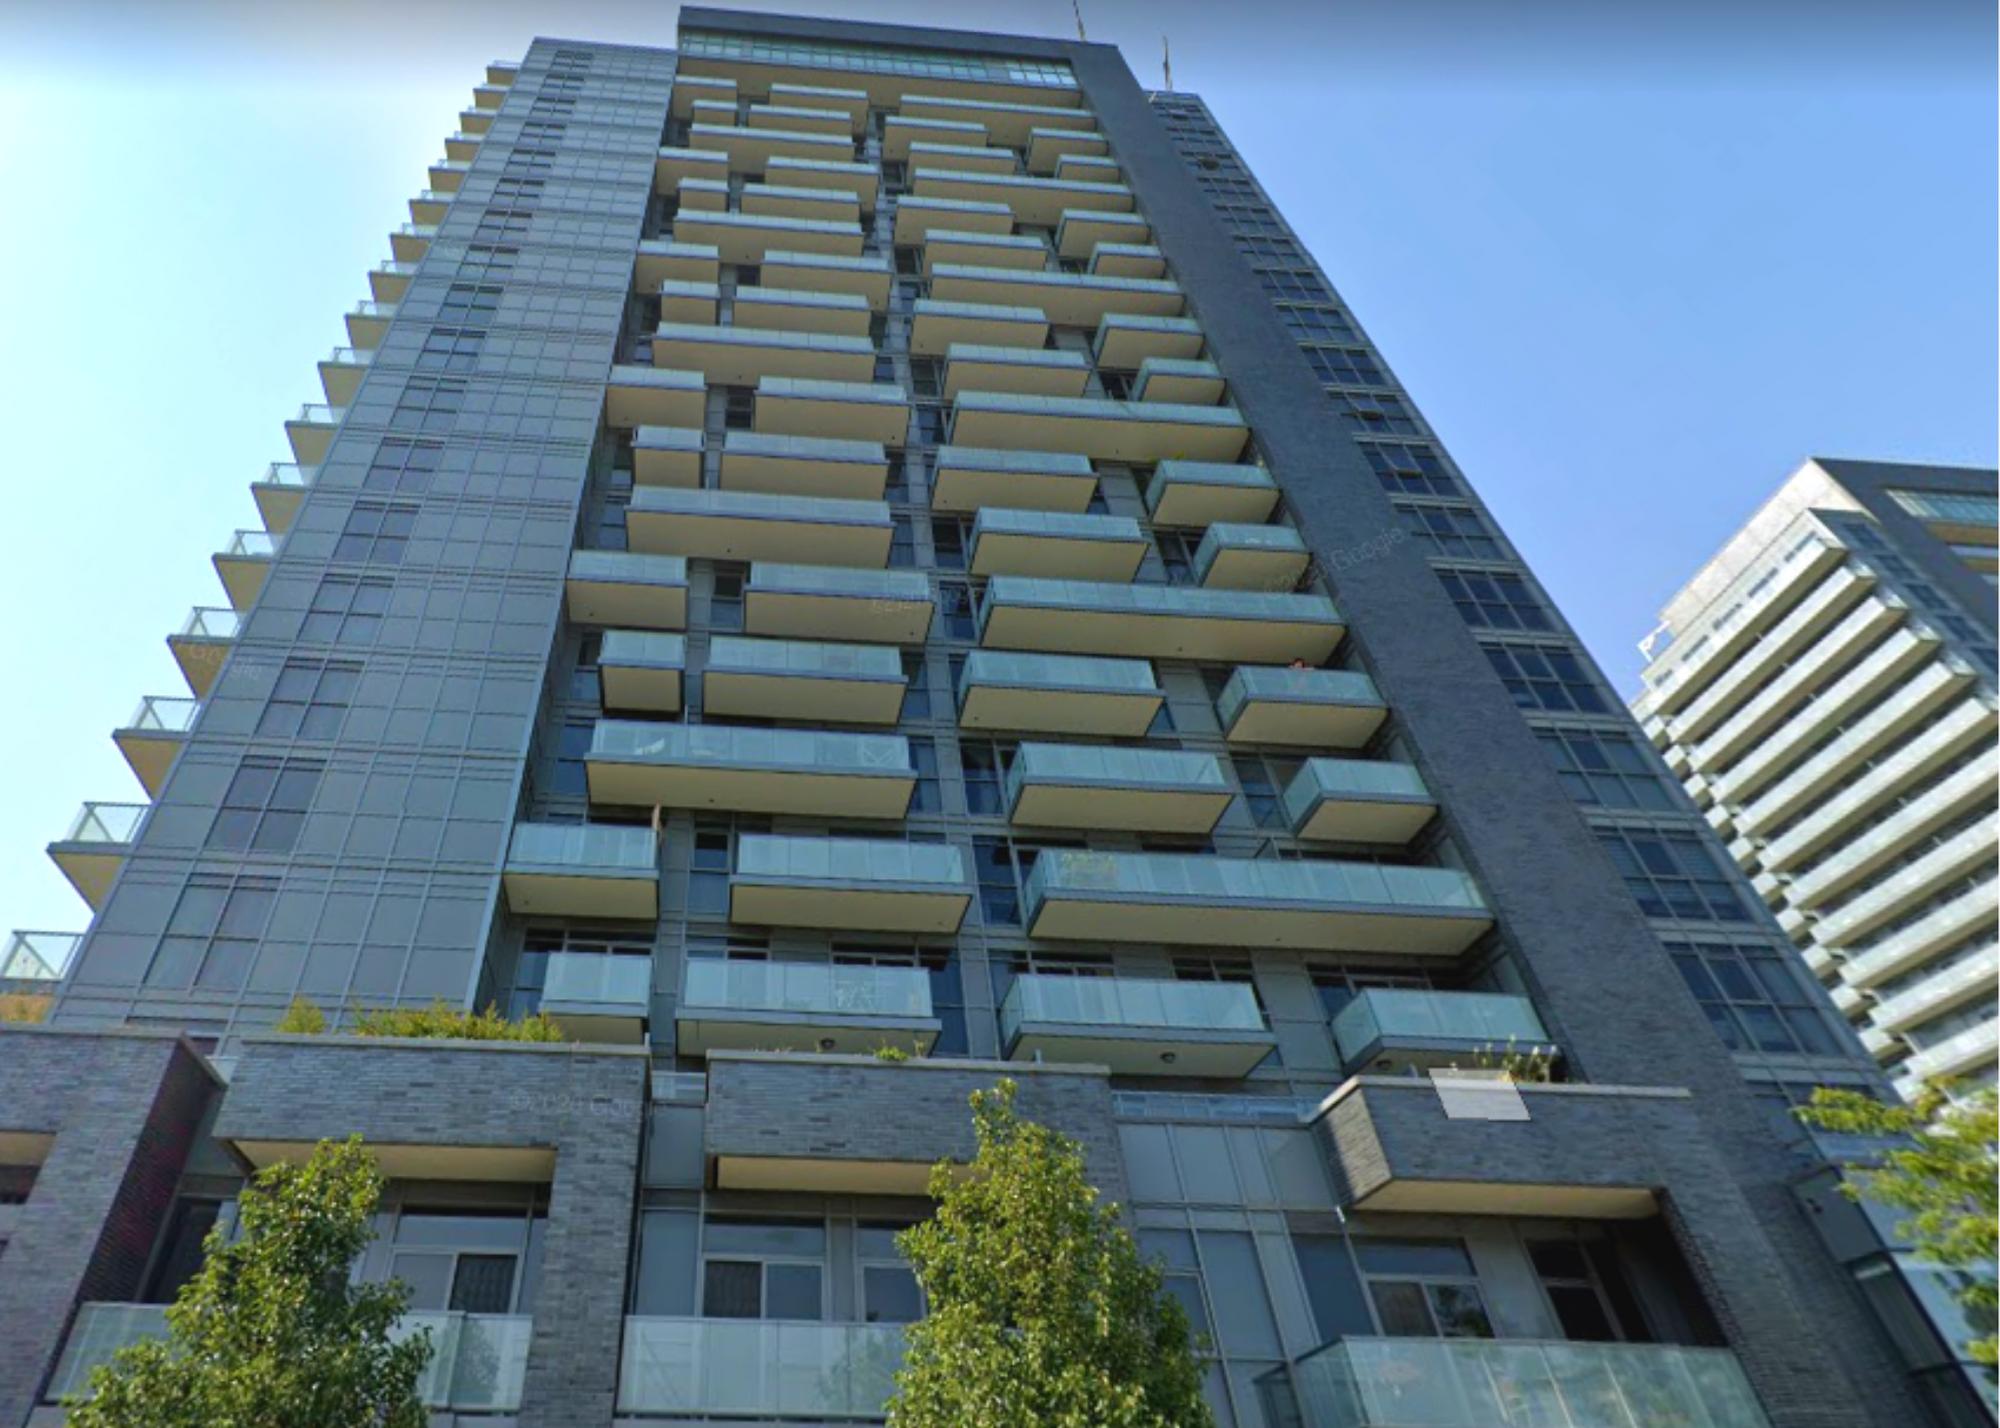 Condominium Building in Richmond Hill